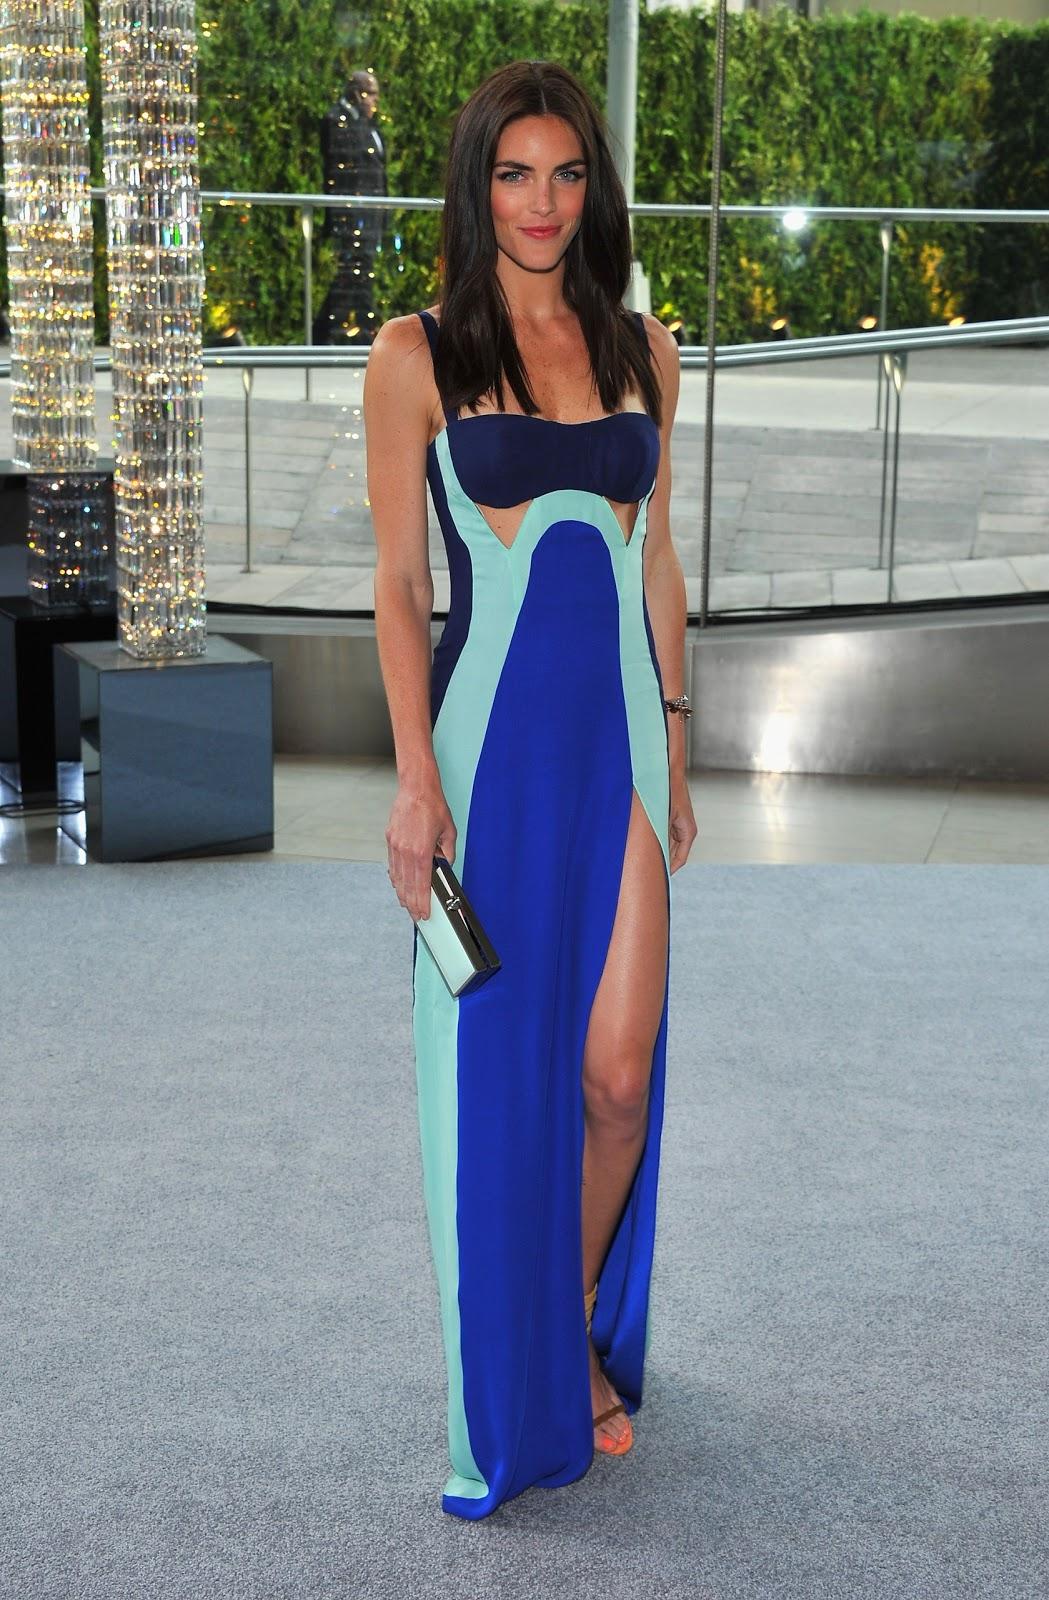 Hilary Rhoda ♥ 2012 CFDA Fashion Awards HQ - Models Inspiration